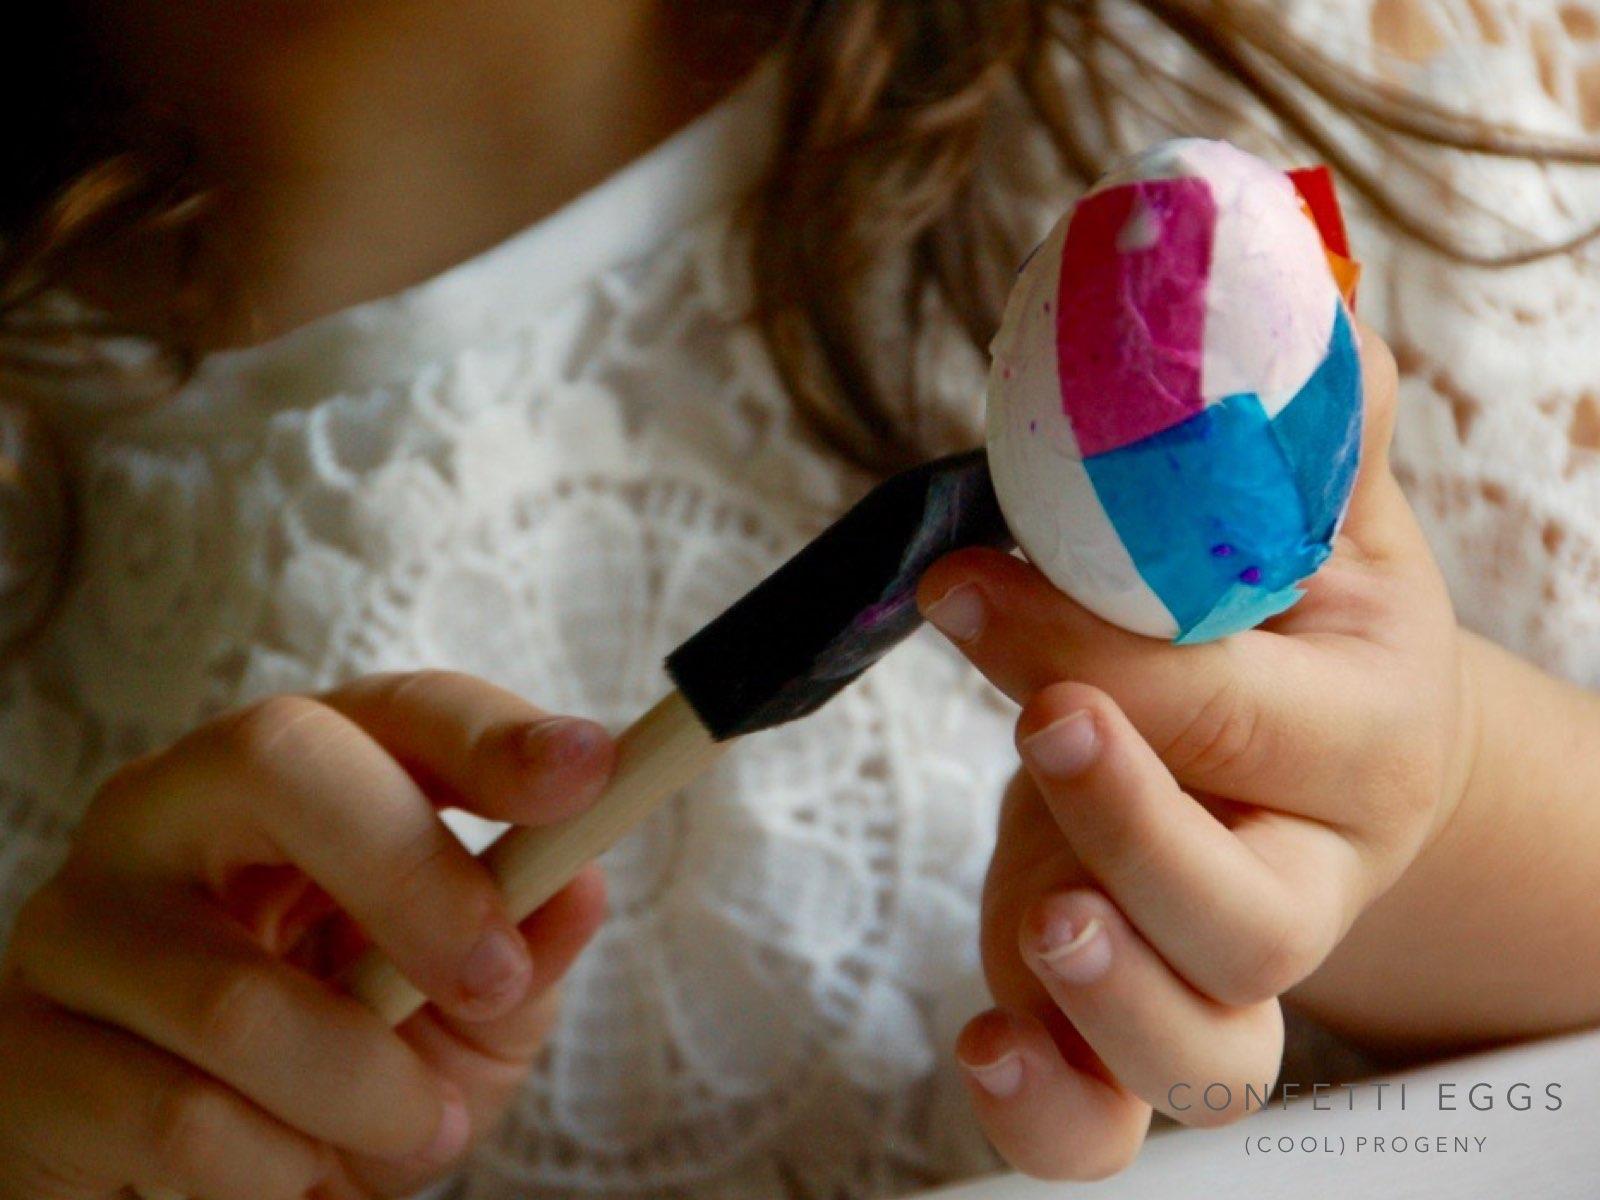 diy confetti easter eggs - (cool) progeny